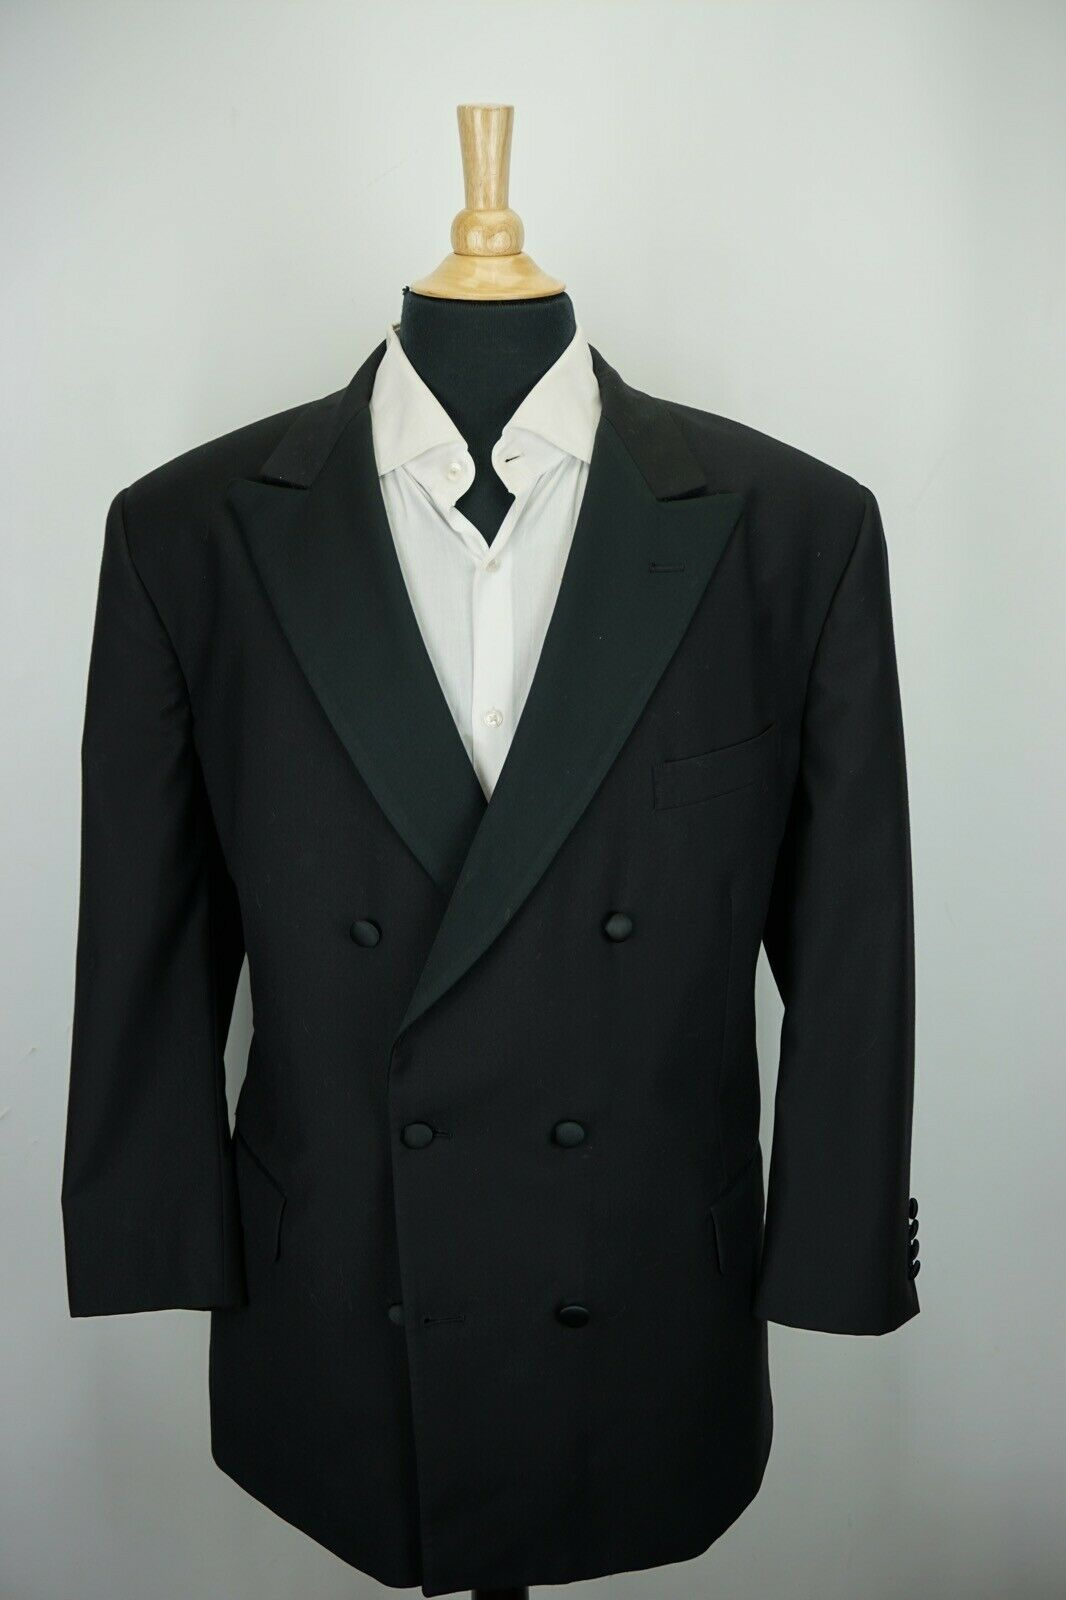 Brooks Brothers 1818 Madison DBL Breasted Peak Lapel Black 2 Pc Tuxedo 48R BIG